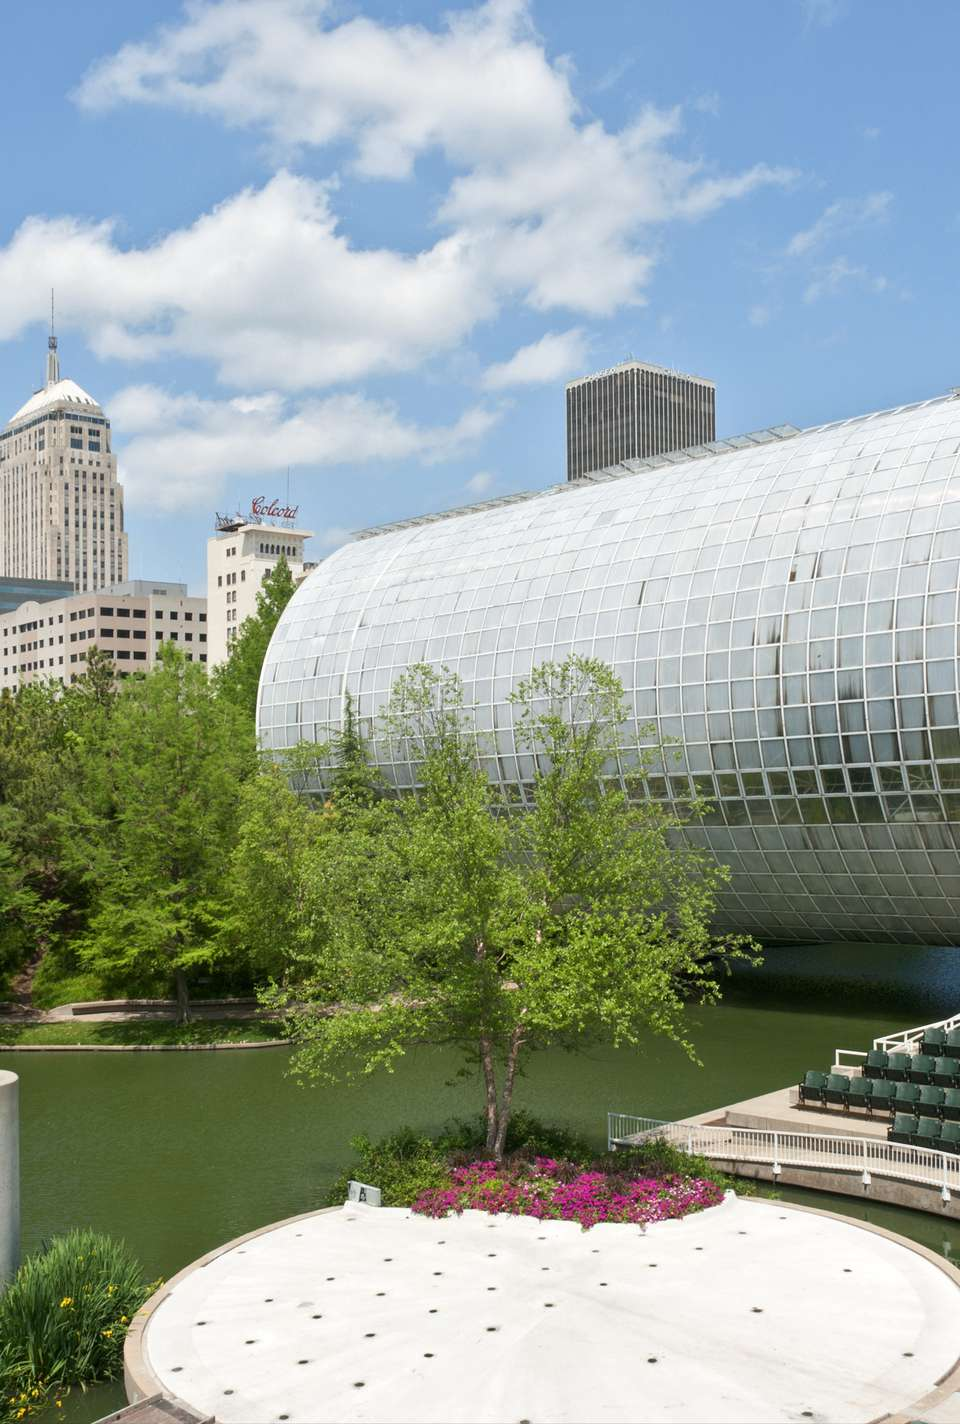 Myriad Botanical Gardens and Crystal Bridge Tropical Conservatory.